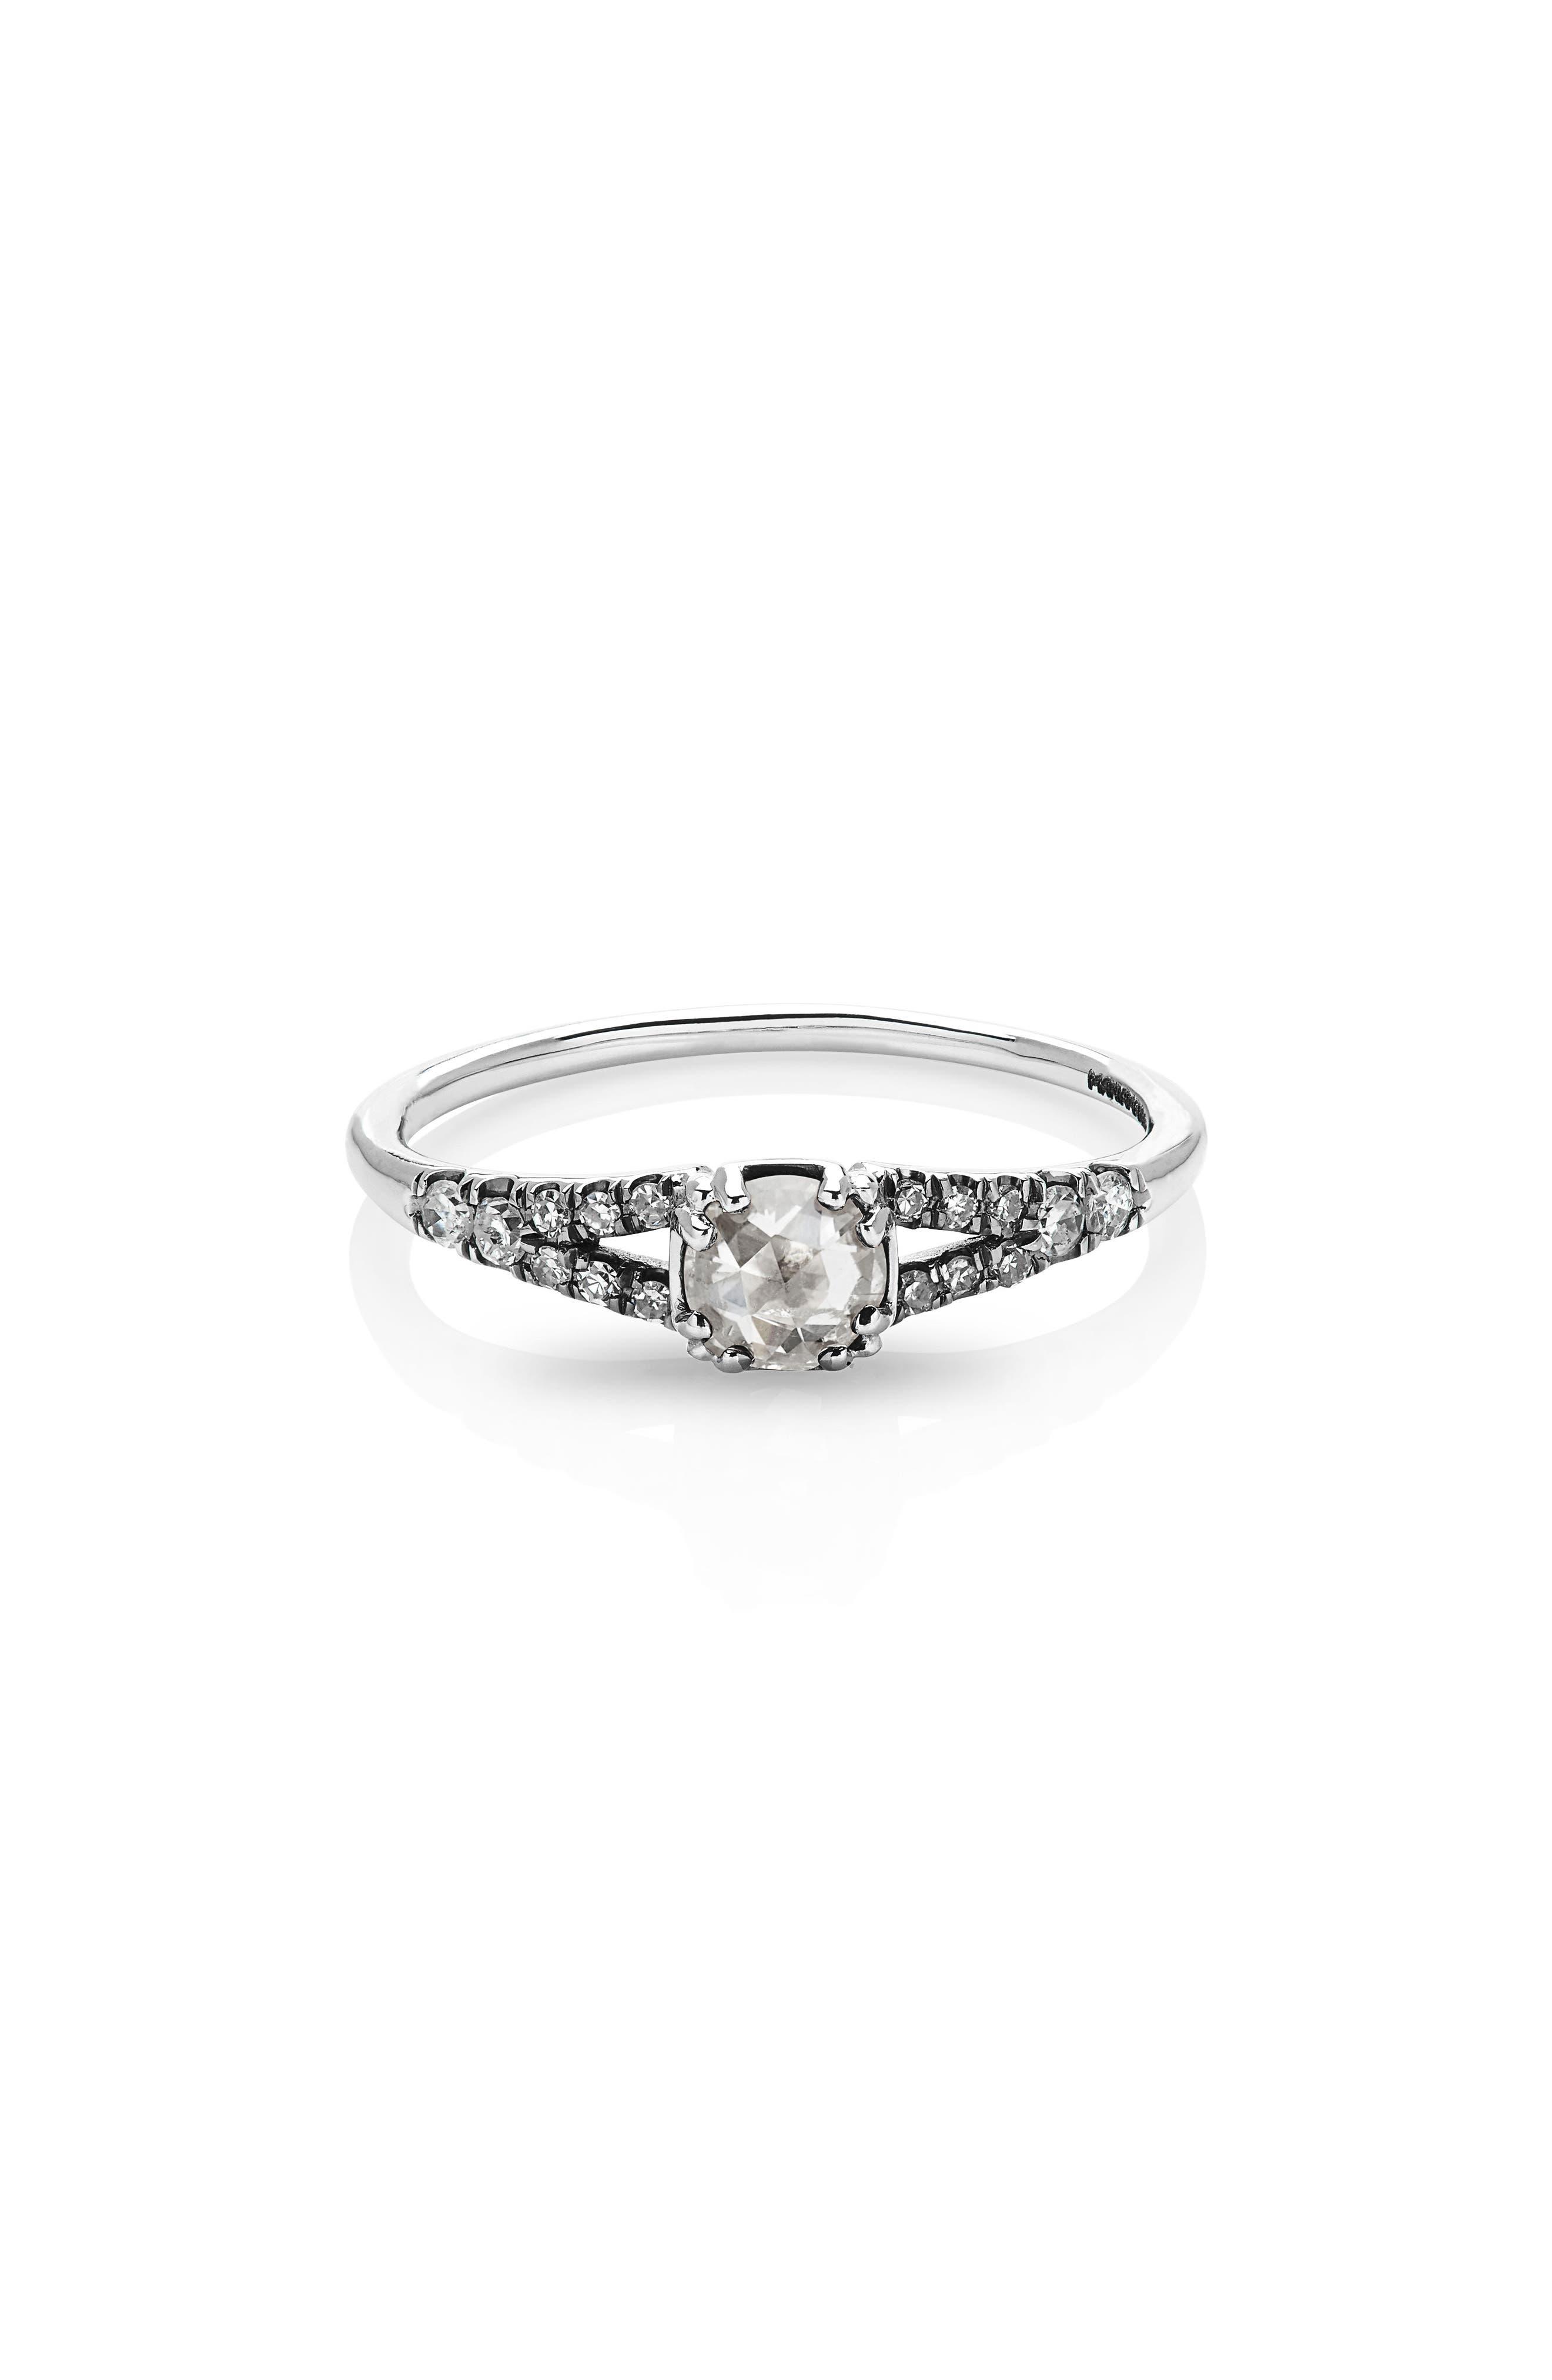 Maniamania Devotion Solitaire Diamond Ring